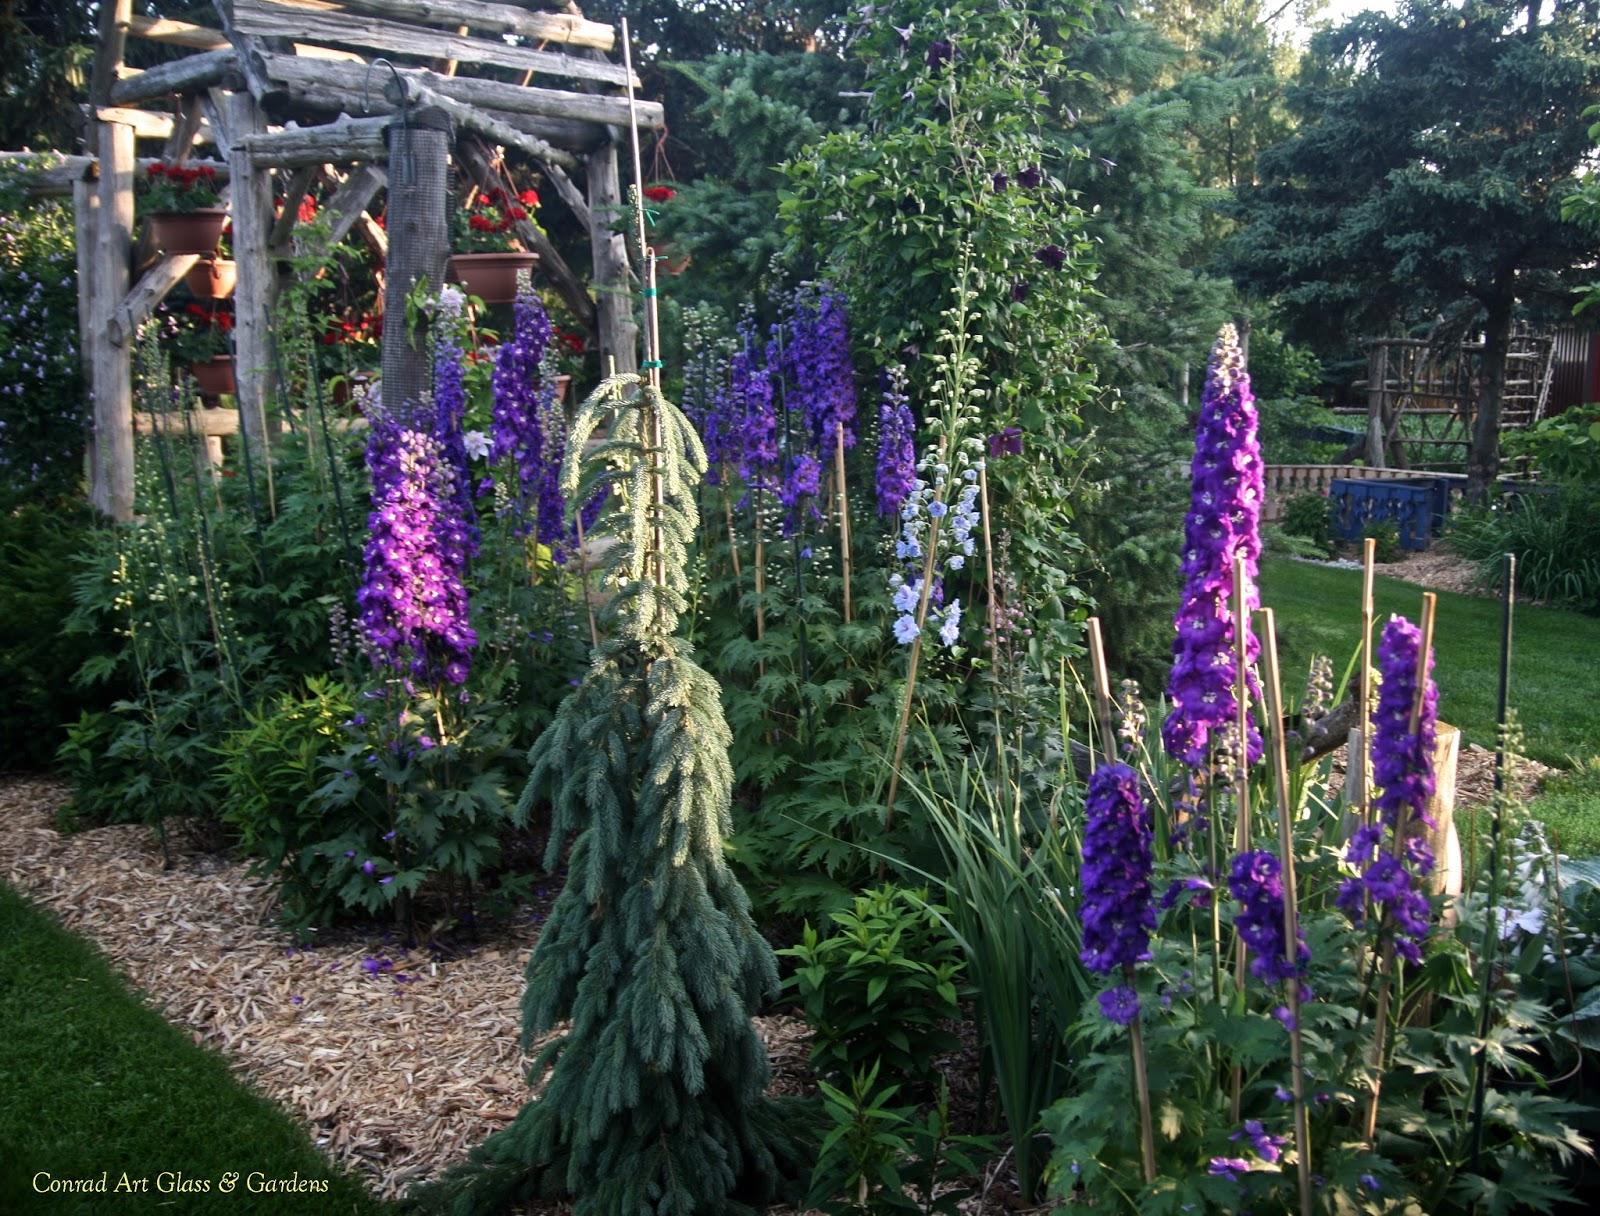 Conrad Art Glass & Gardens: Gardens on summer's edge